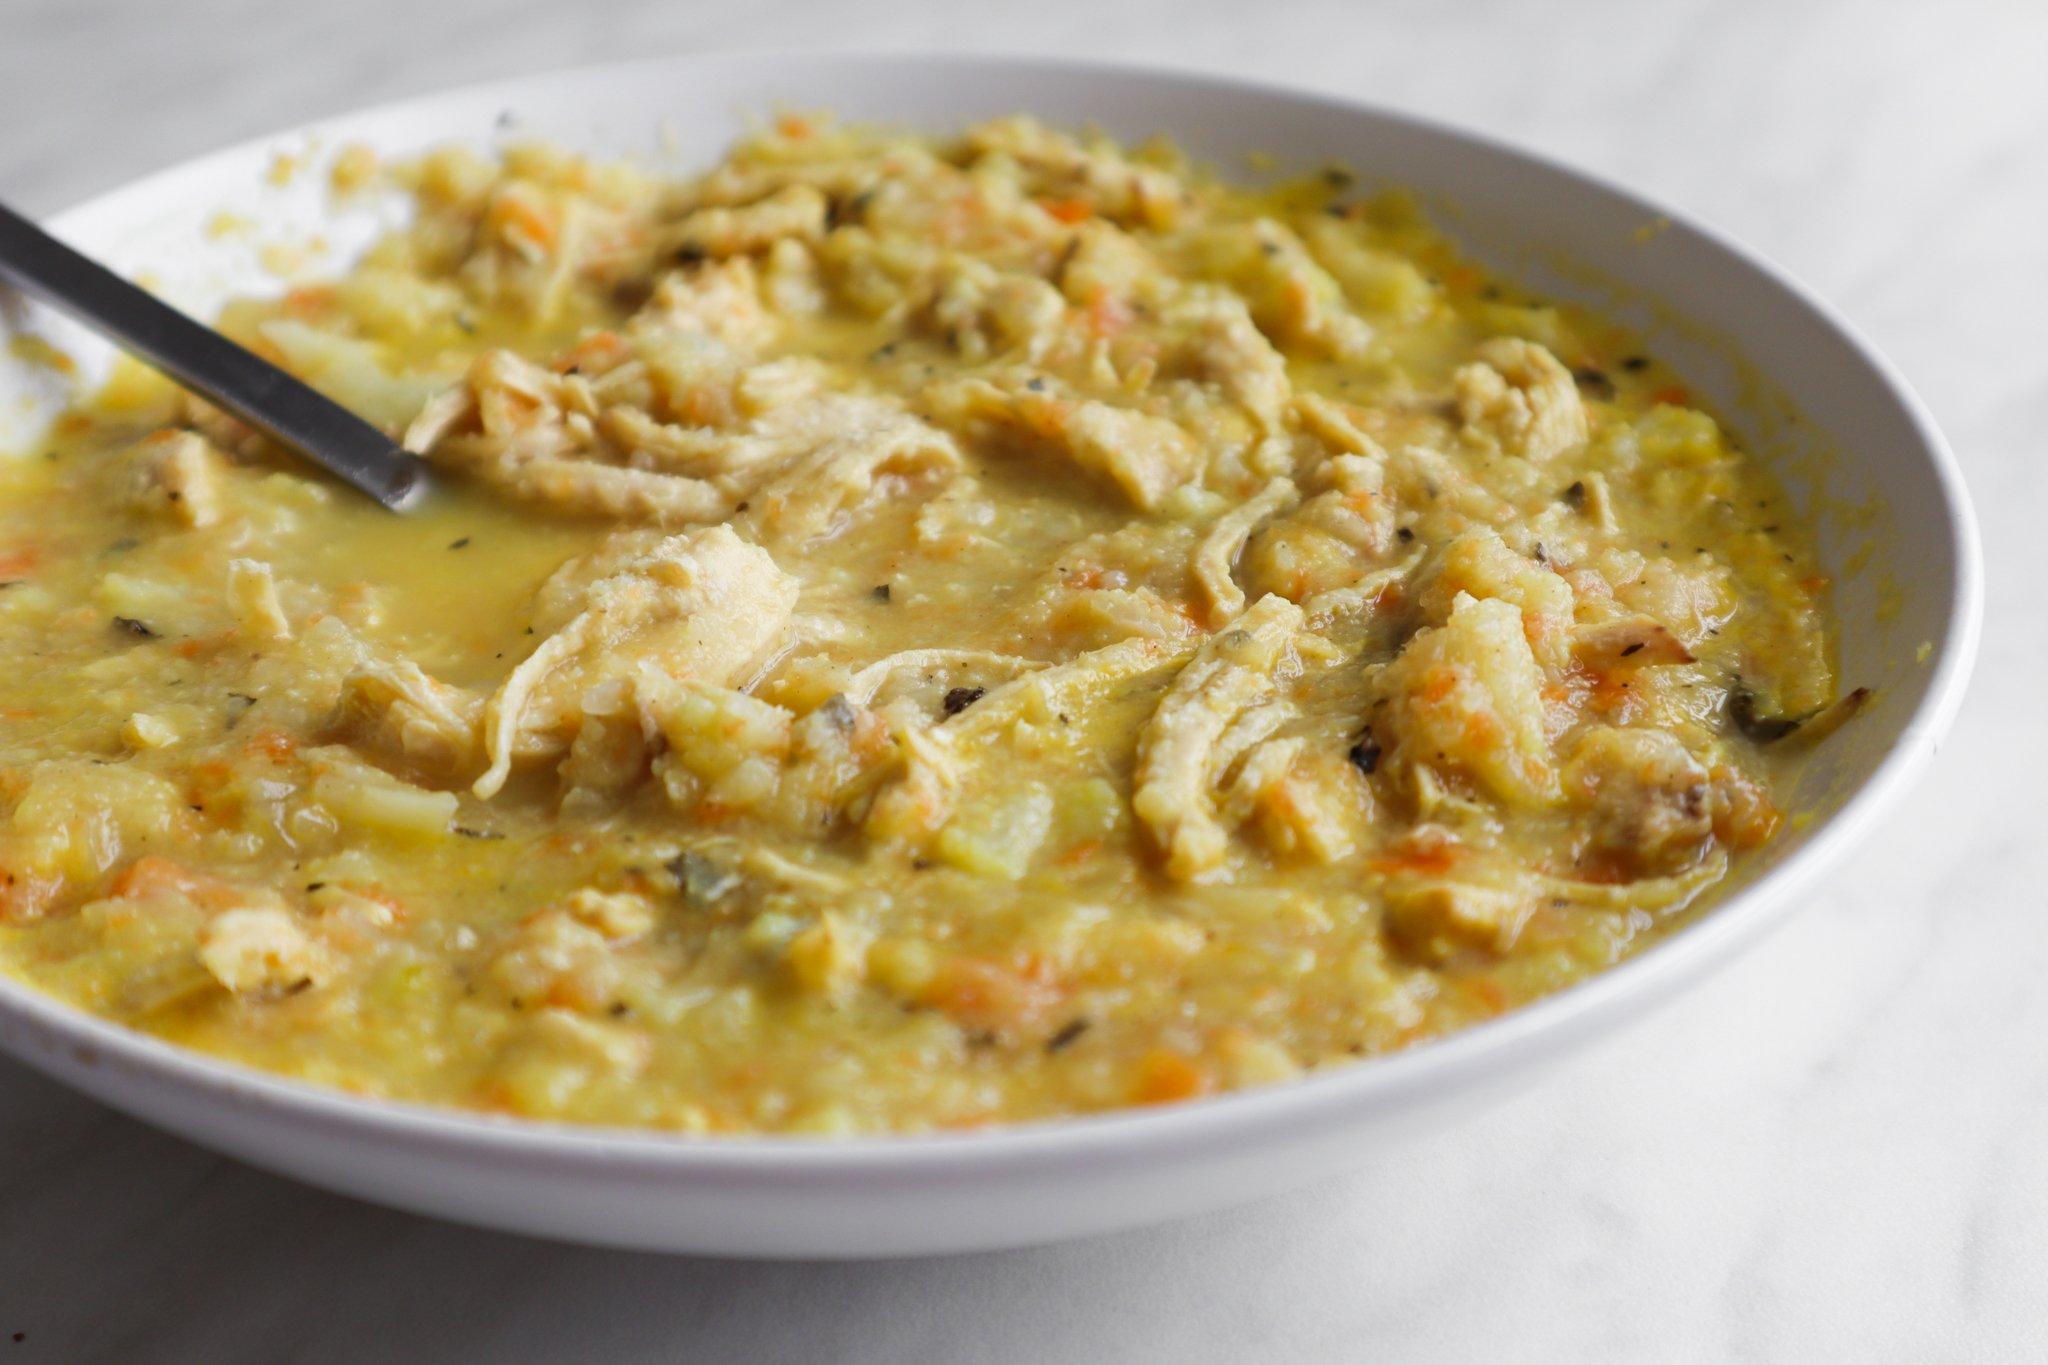 anti-inflammatory chicken soup - easy leftover chicken recipe